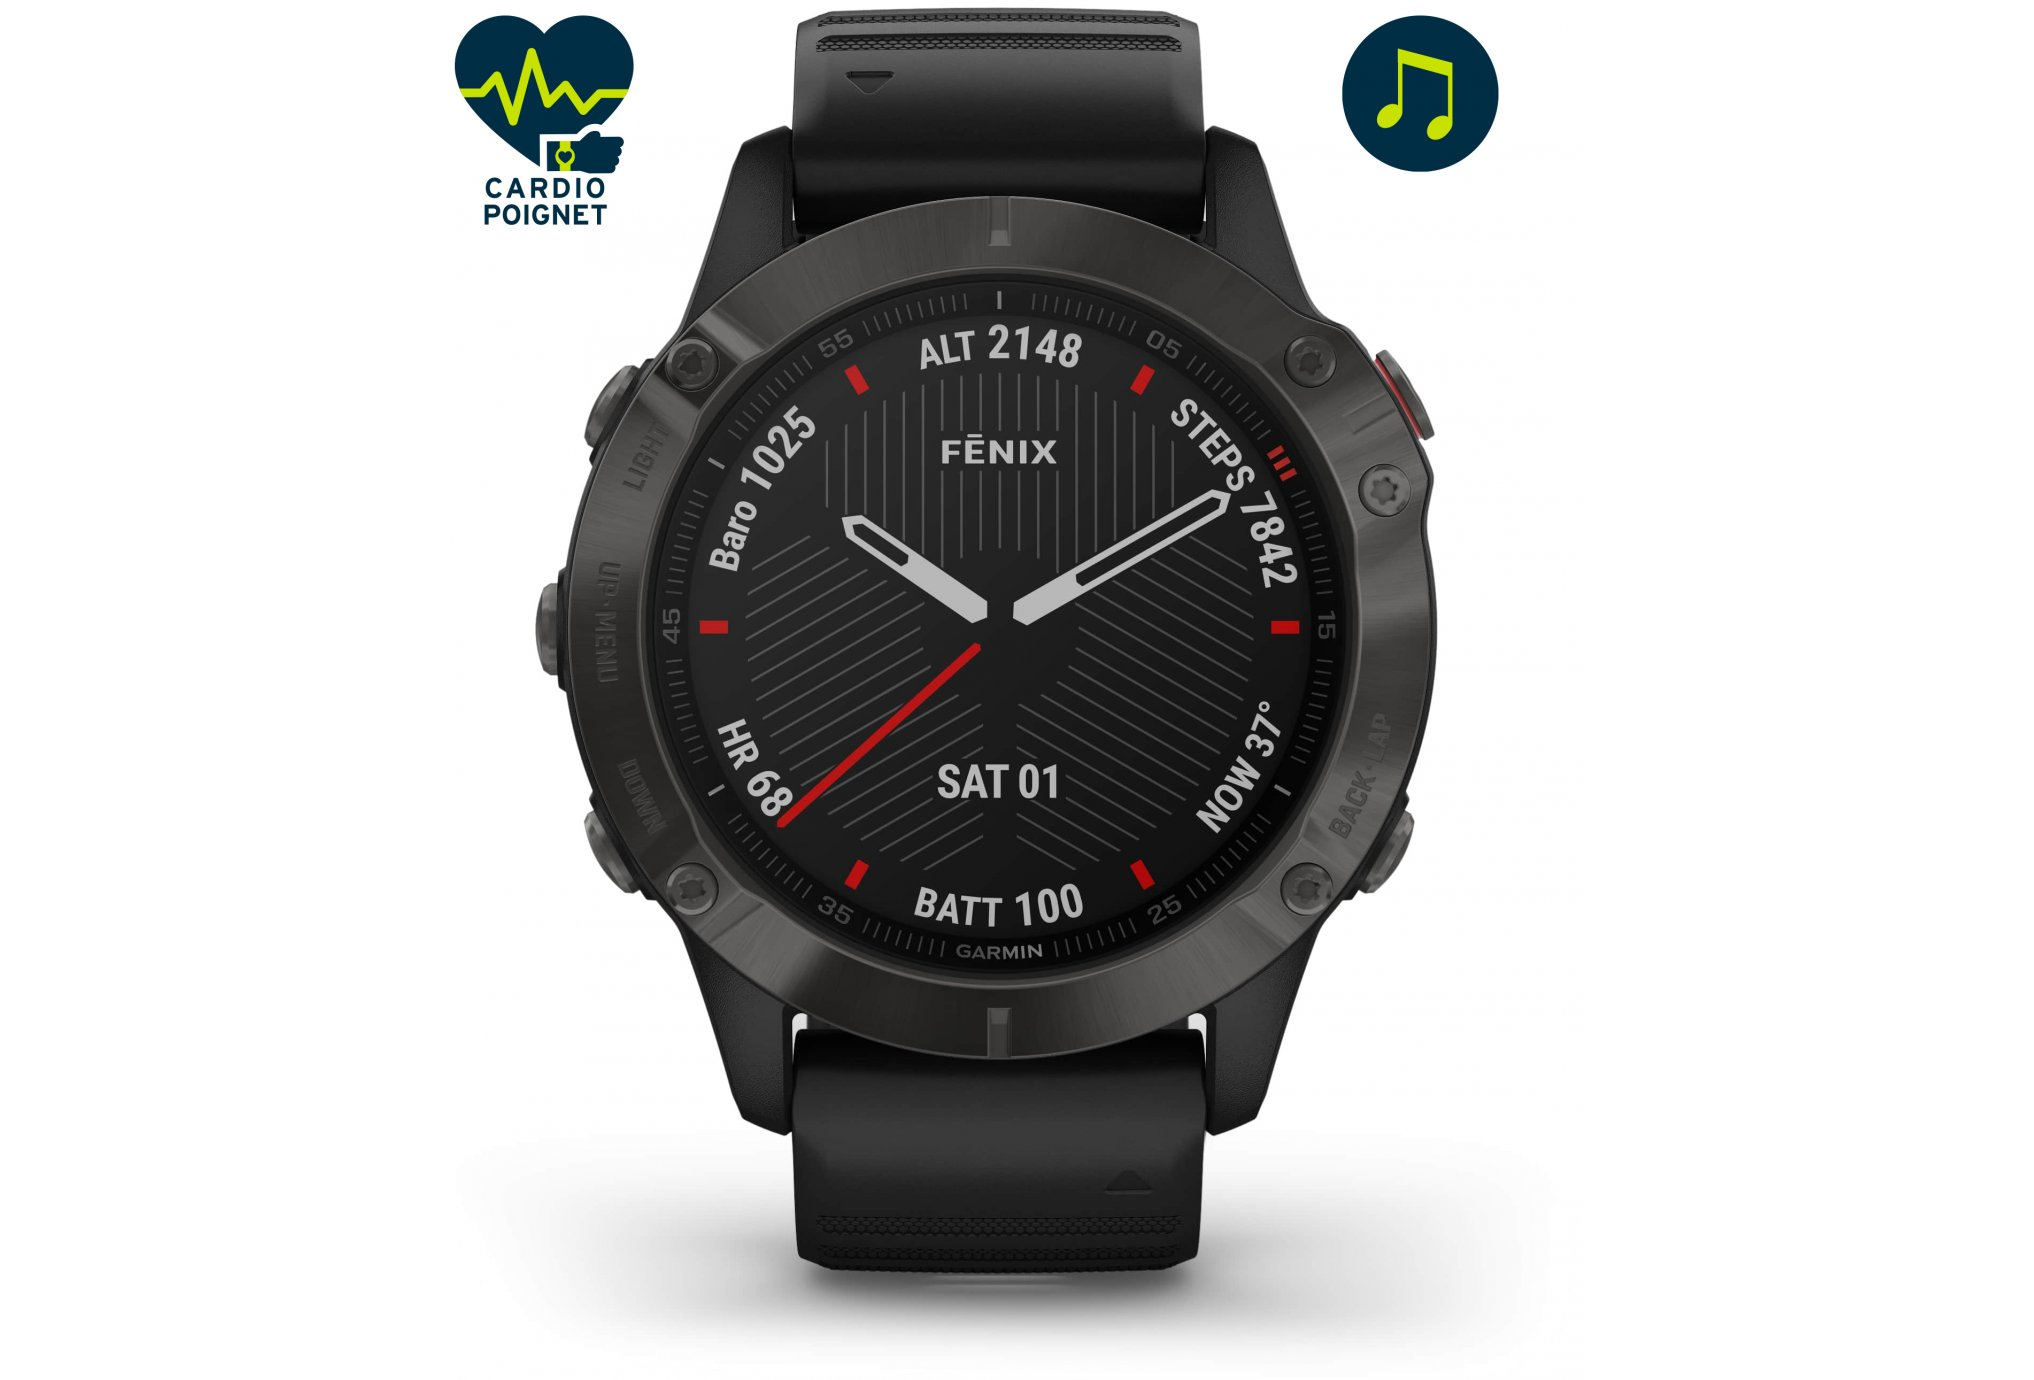 Garmin Fenix 6 Zafiro Cardio-Gps